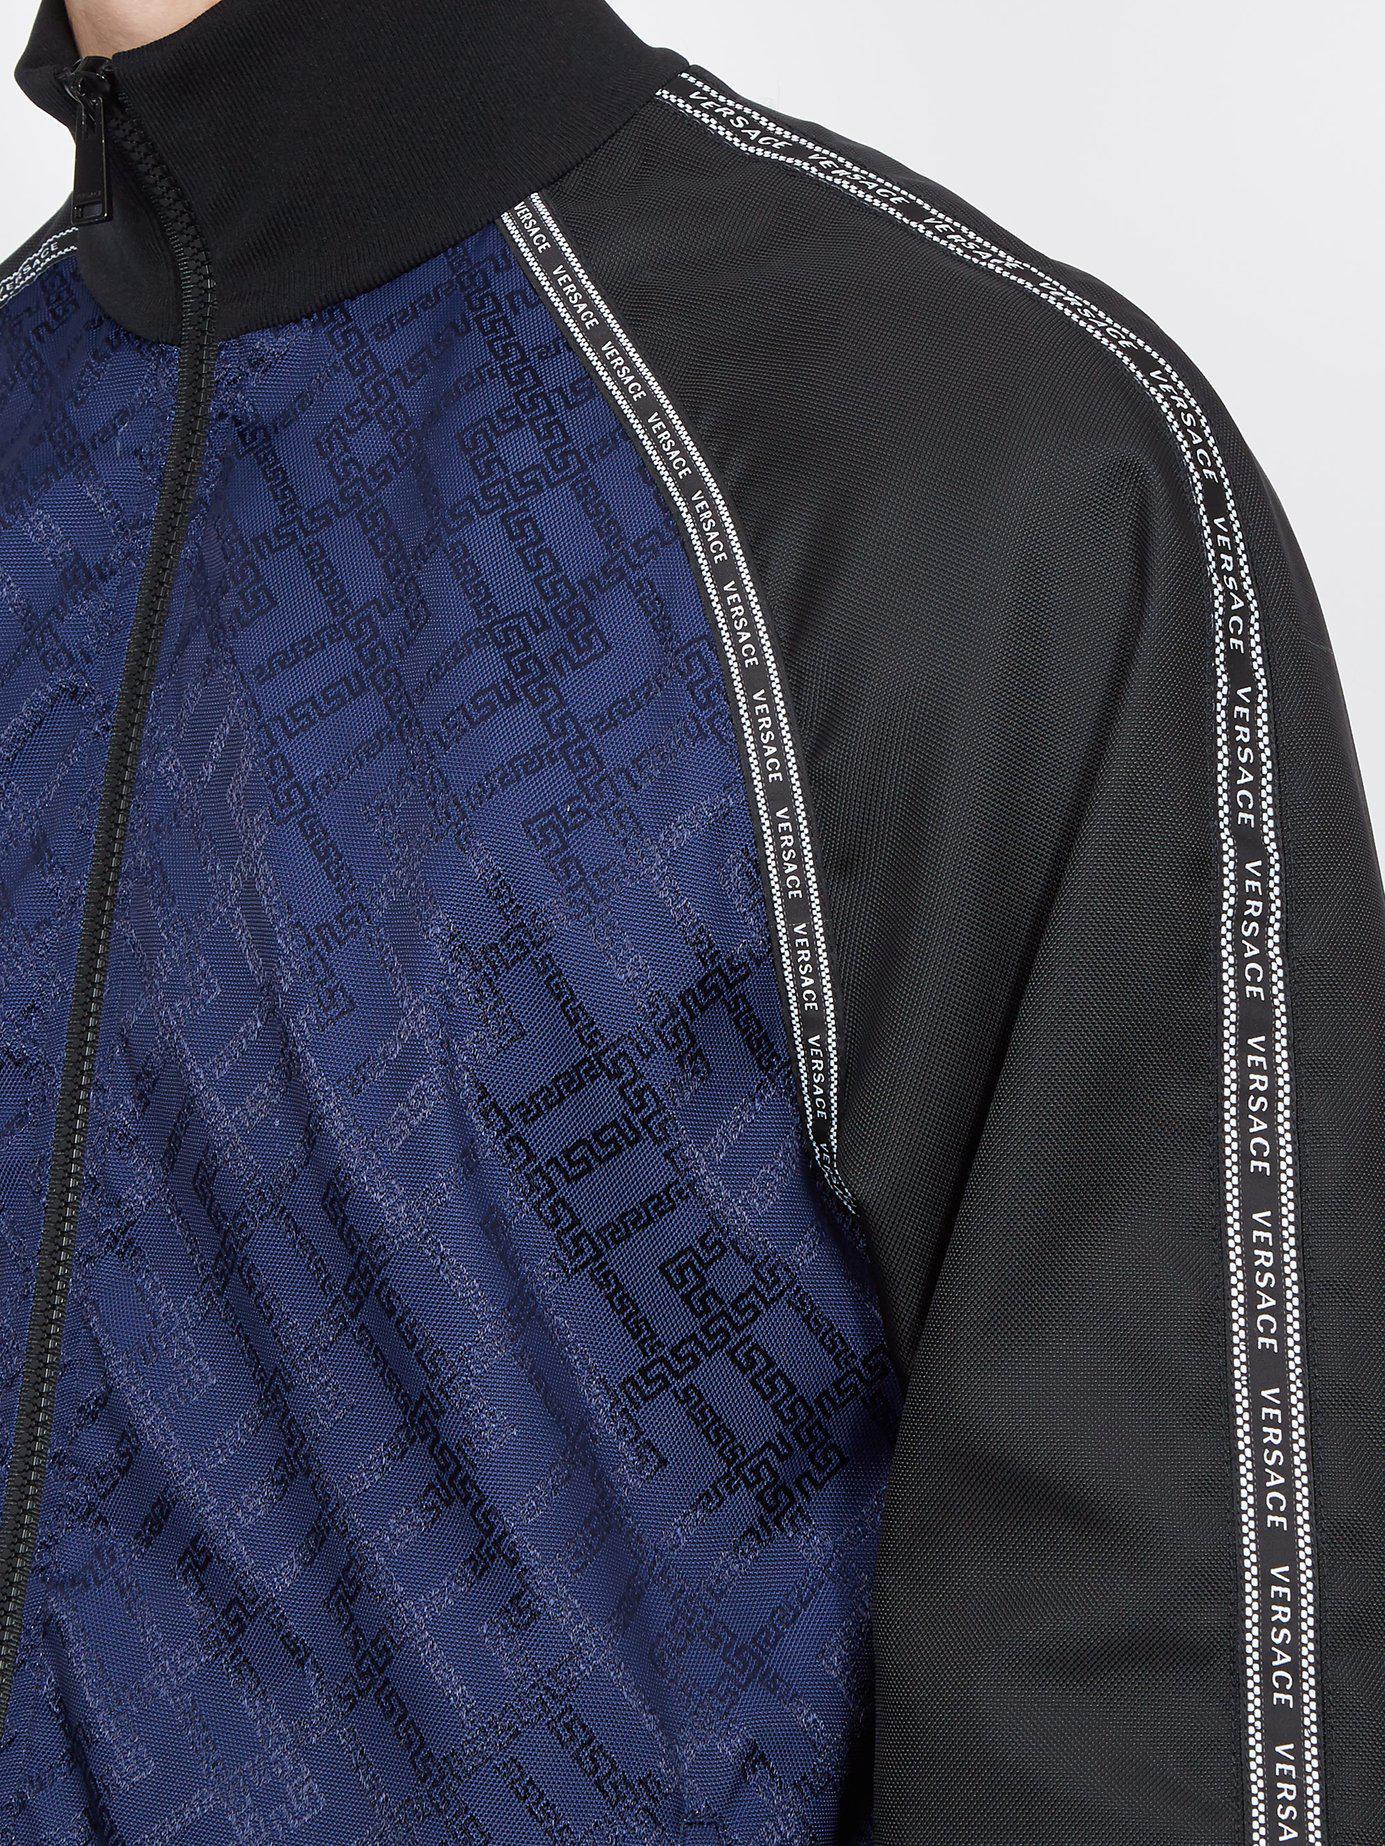 01a816b02f1a ... Jacquard Track Jacket for Men - Lyst. View fullscreen